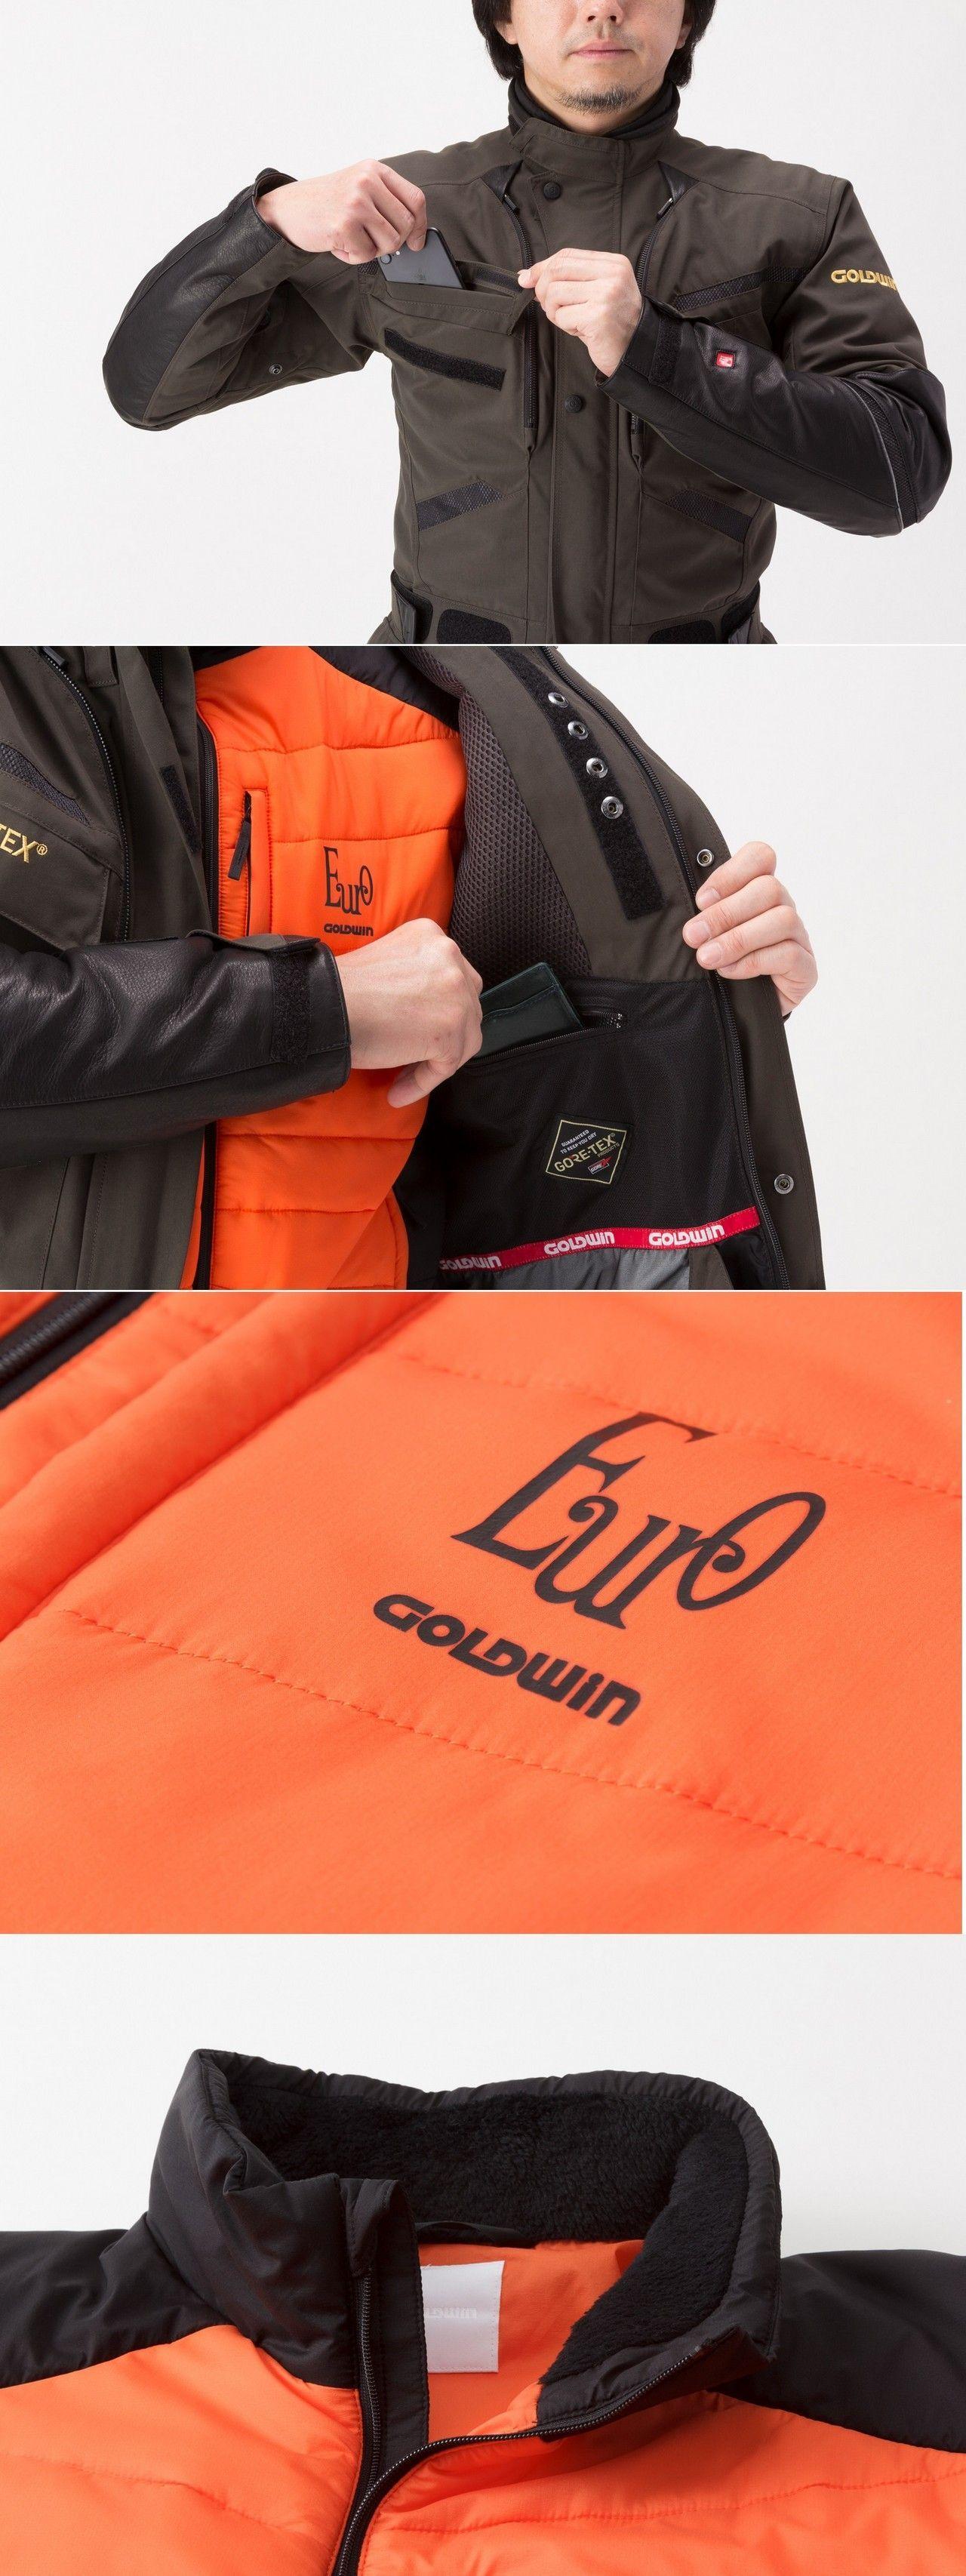 【GOLDWIN】GWS EURO  Road Master外套 GSM22750 - 「Webike-摩托百貨」